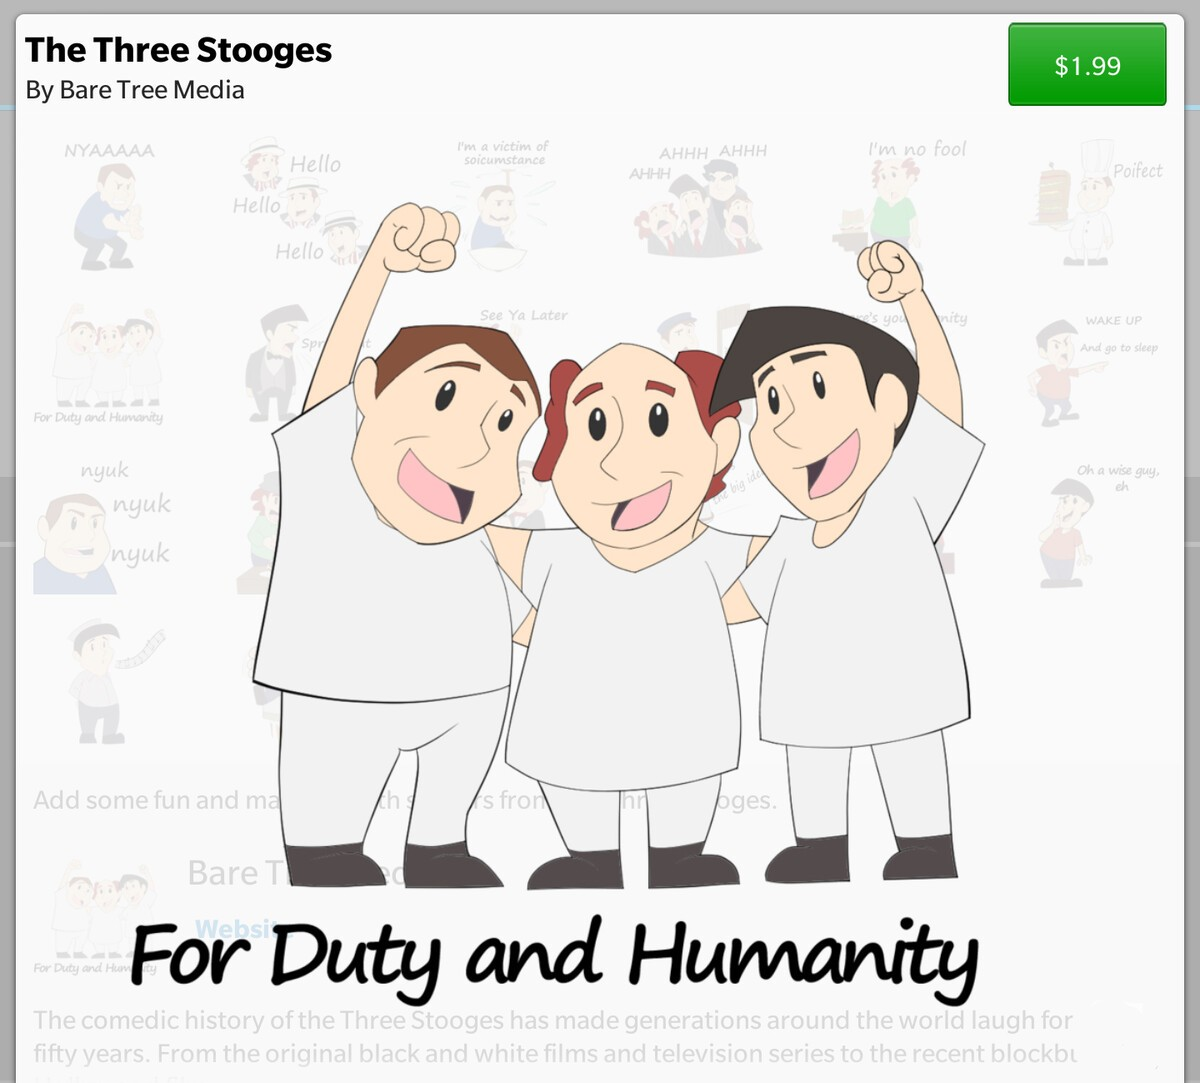 Nyuk, nyuk, nyuk! Three Stooges BBM stickers now available